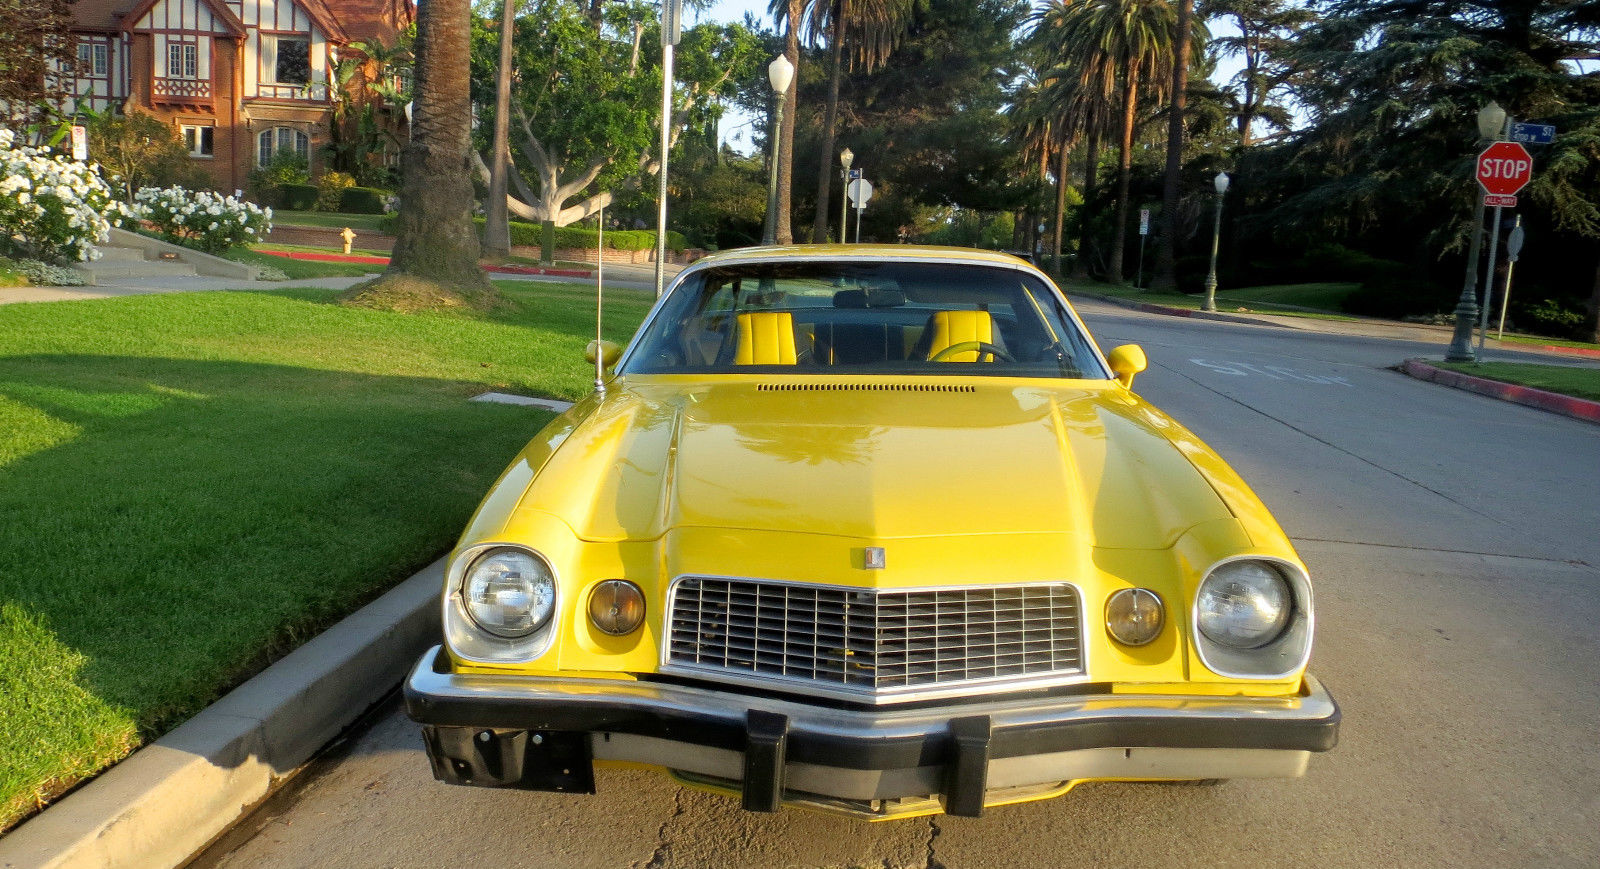 1976 Chevrolet Camaro LT 5 7L 350 Daytona yellow - Muscle Car